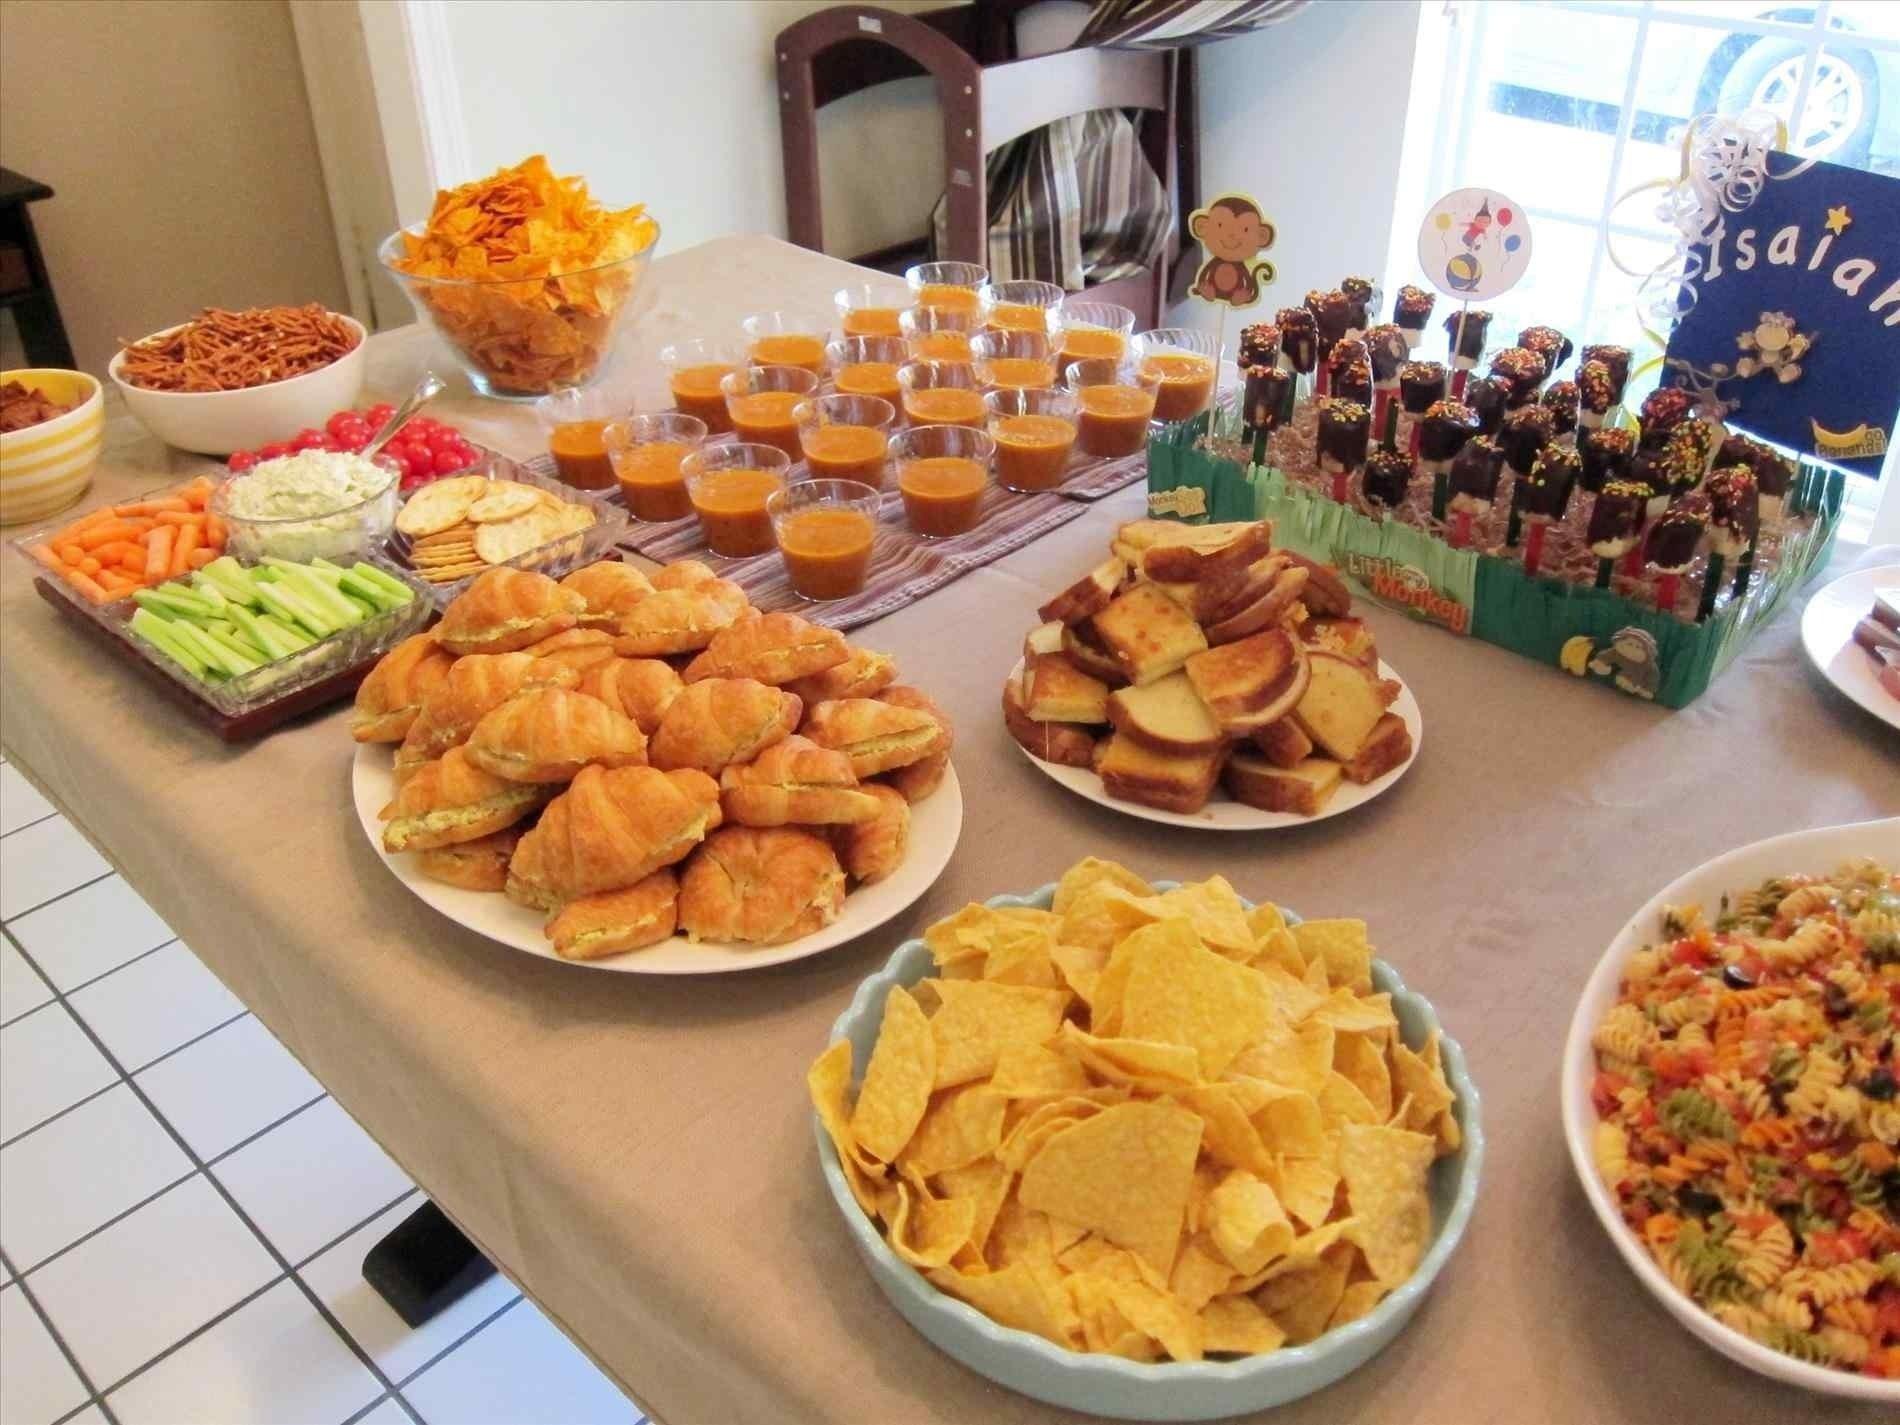 10 Pretty Birthday Party Finger Food Ideas For Adults birthday party finger food ideas adult gastro rhcreativemaxxcom 2020